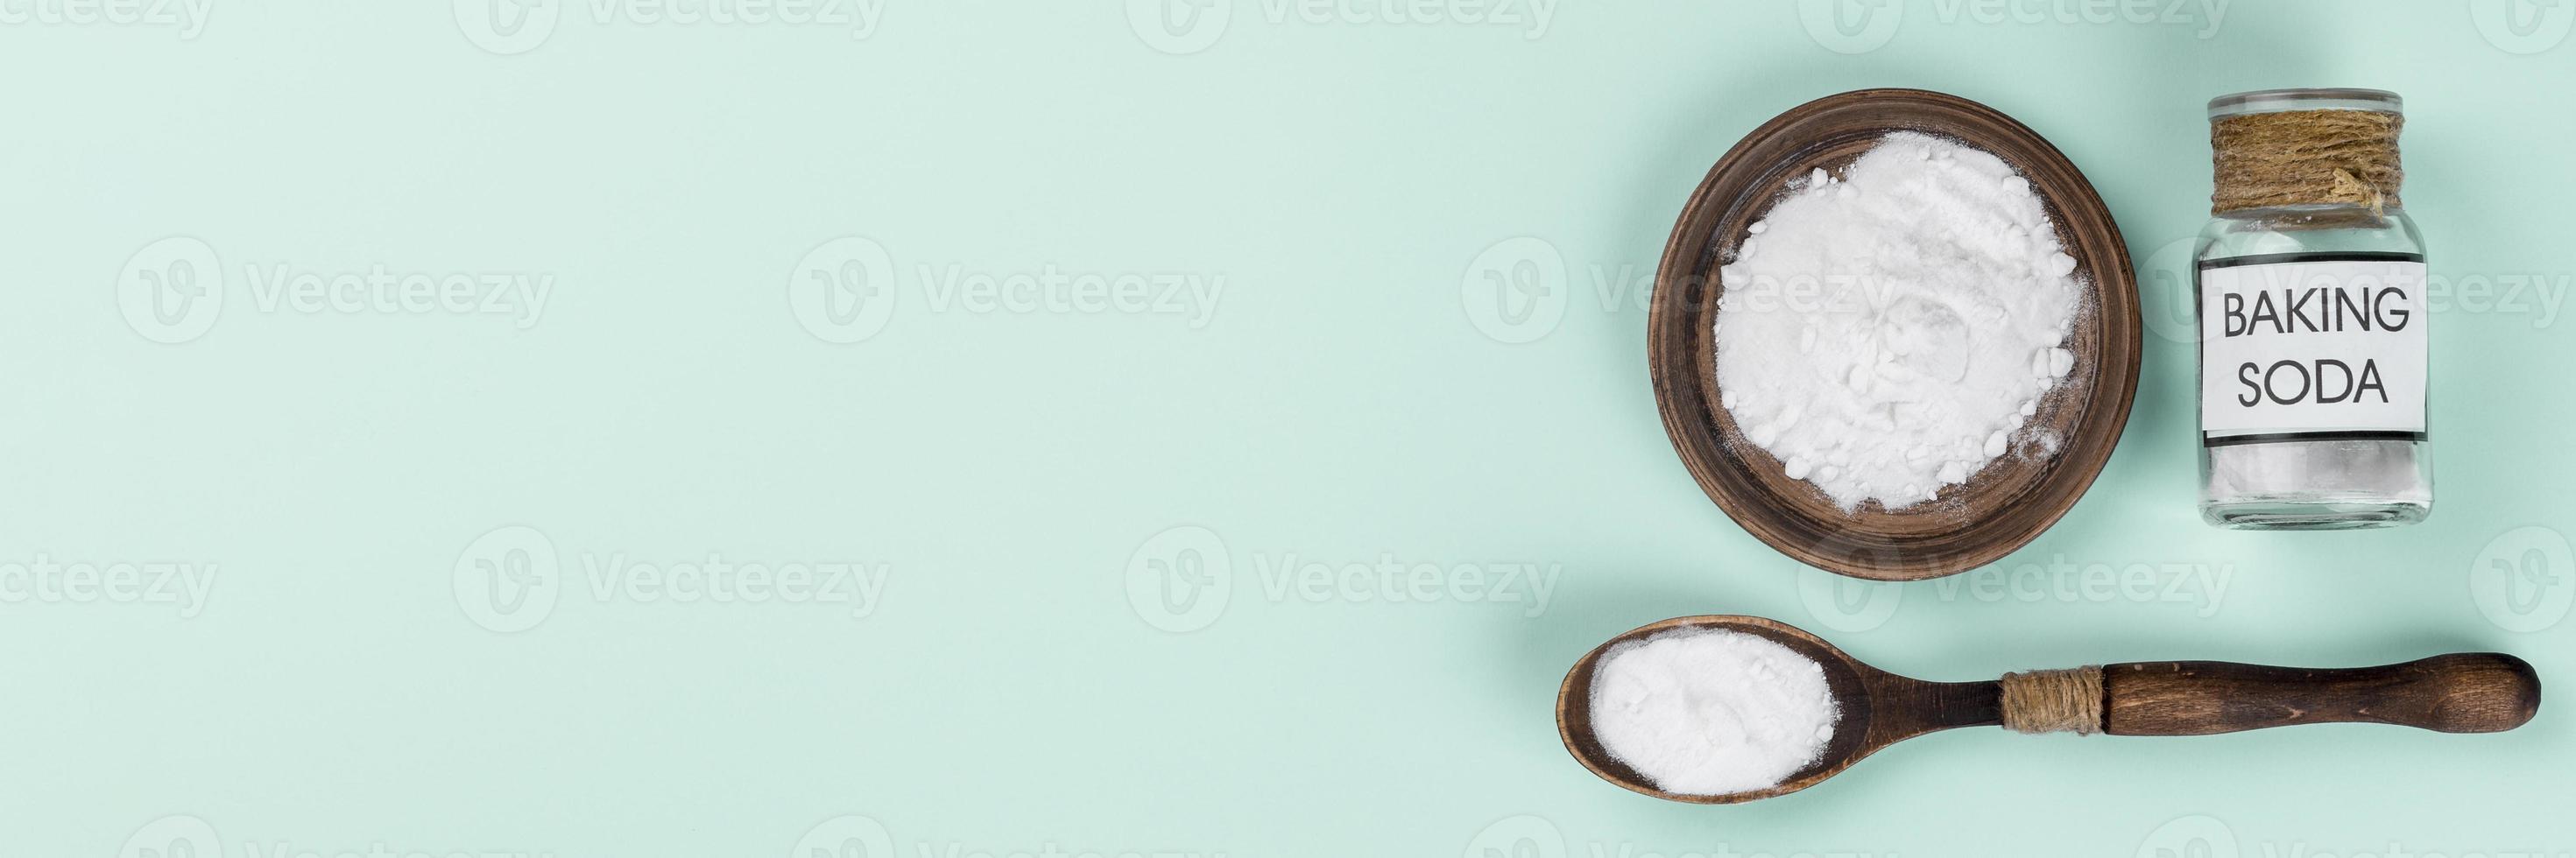 vista superior do produto de limpeza ecológica de bicarbonato de sódio foto